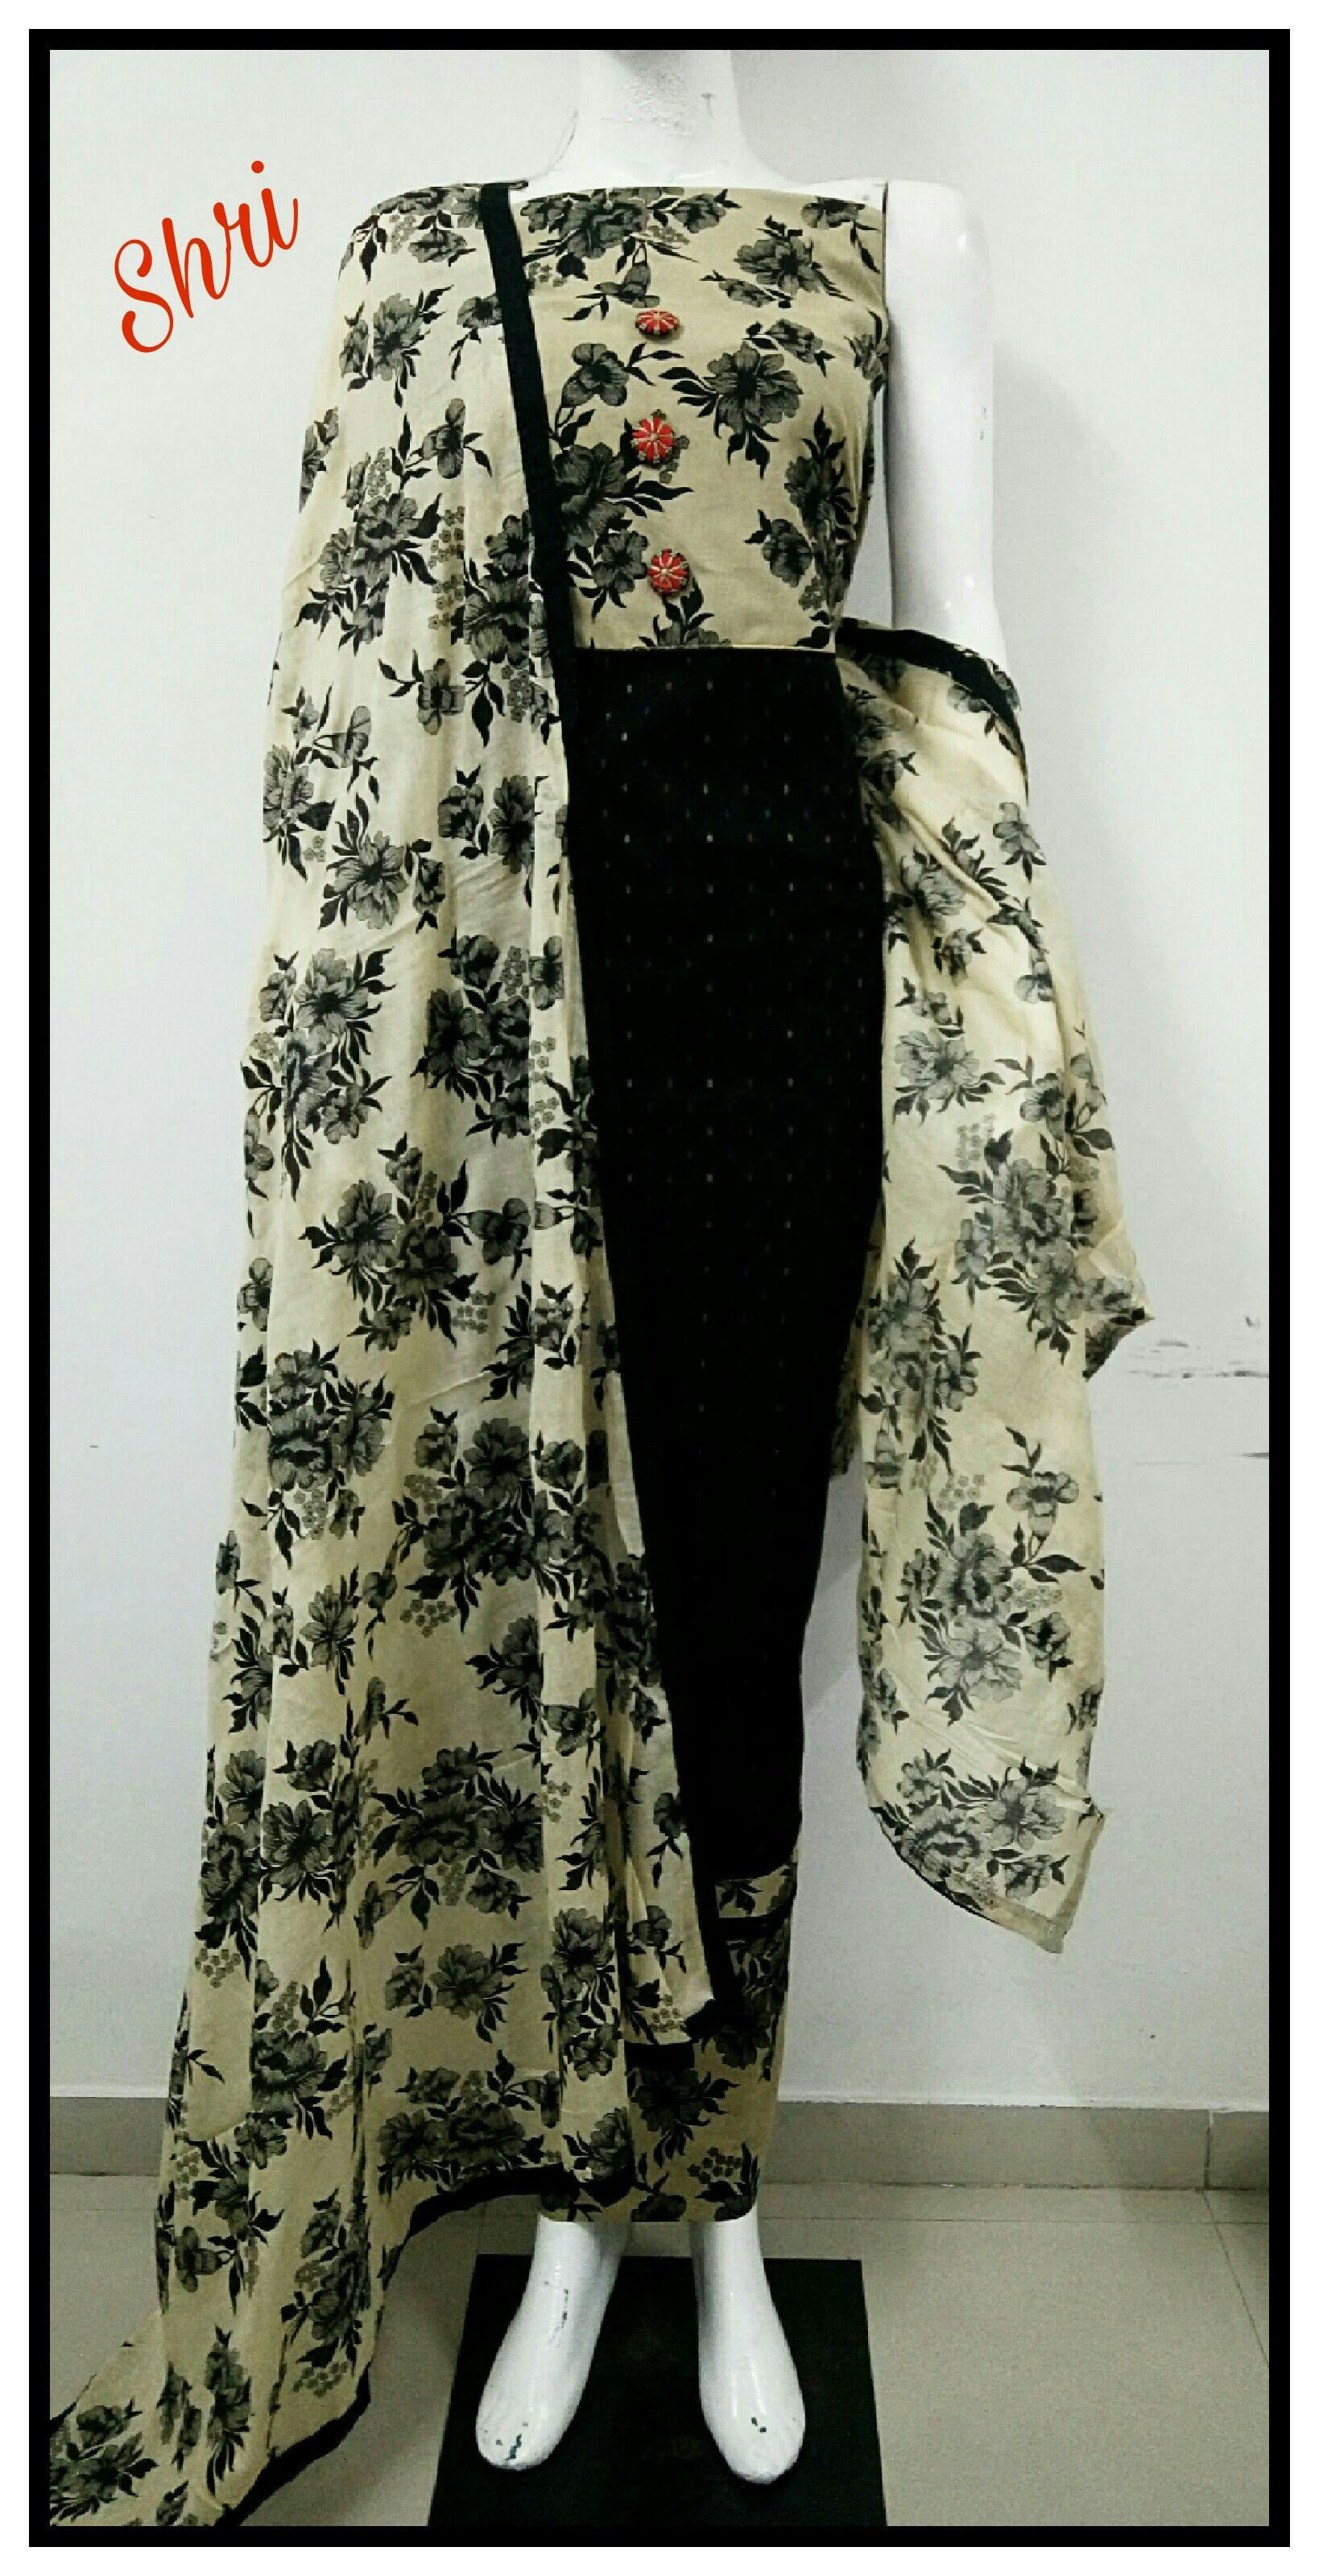 Shri Designer Pure Cotton Kalamkari Non Catalogue Dress Materials